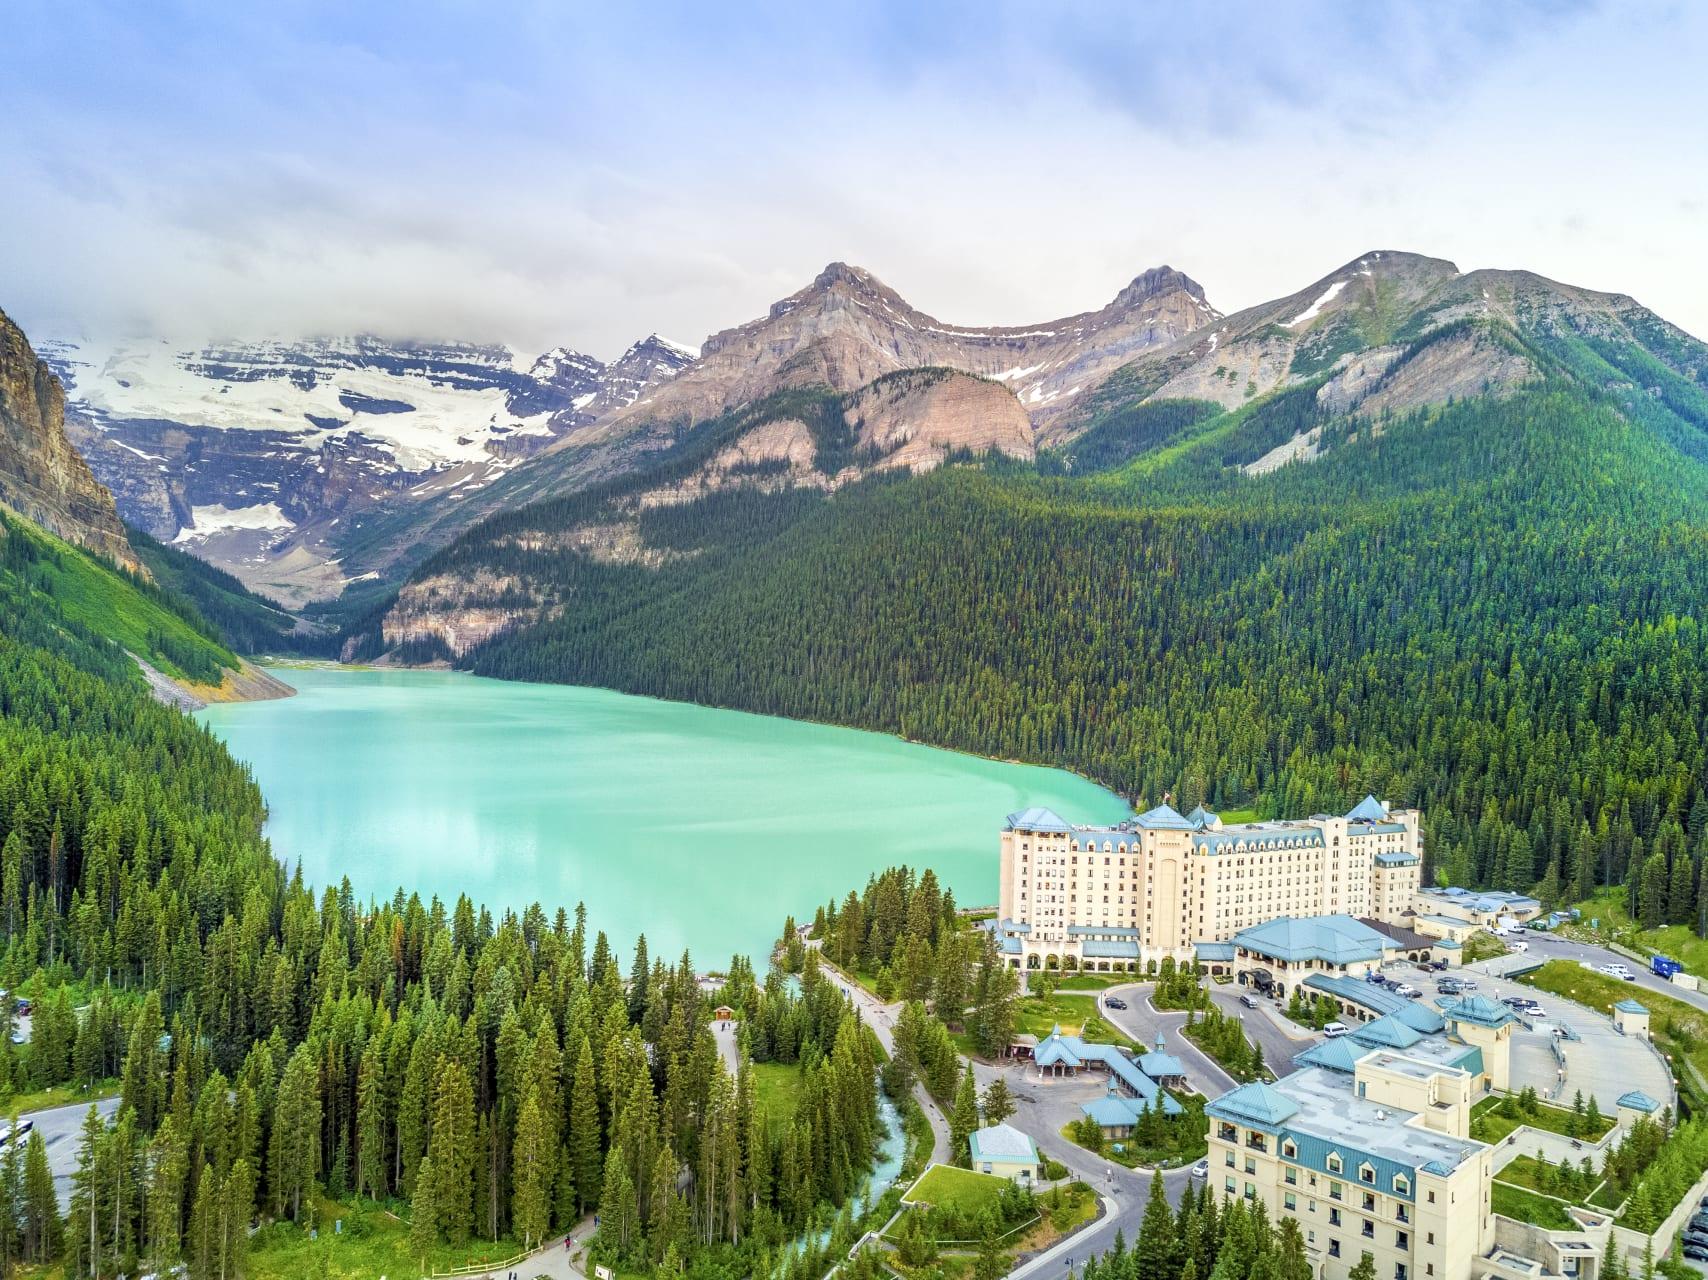 Banff - Lake Louise Ski Area